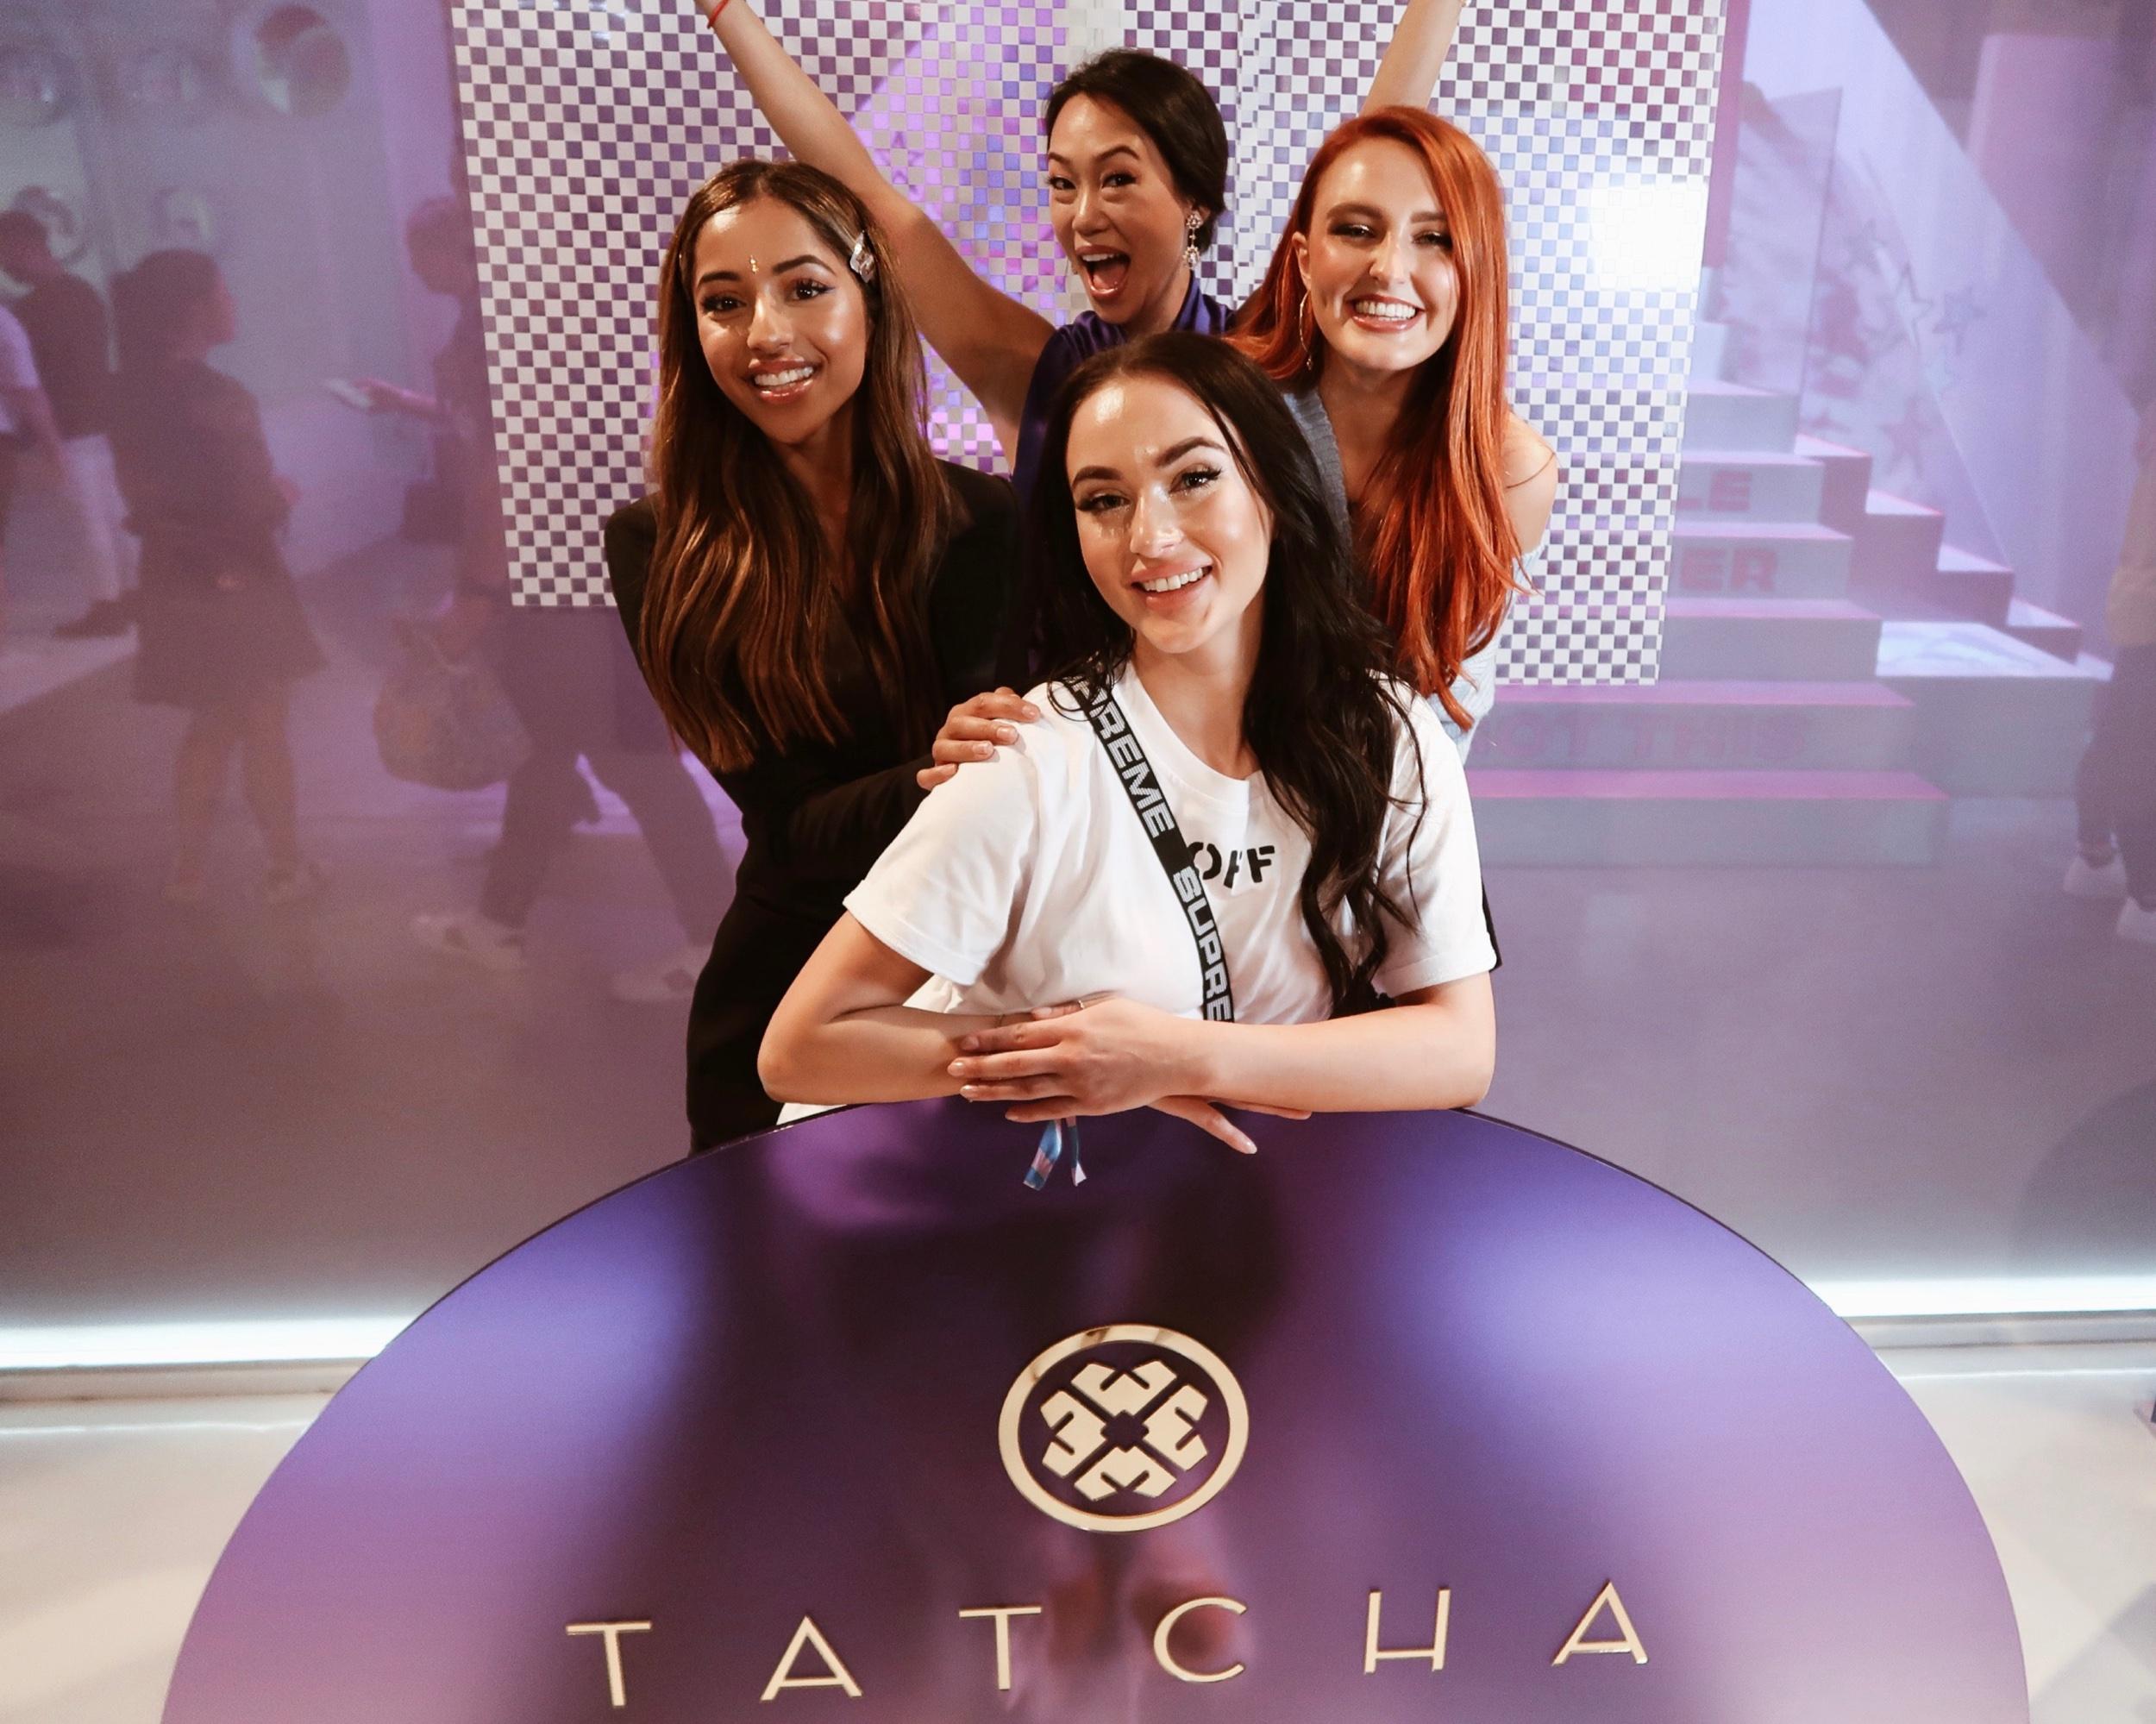 With Vicky Tsai (@vickytsai), Founder of TATCHA, and Brii Wright (@briiwright_) and Abbey Stojanovic (@abbeystojmua) in the TATCHA booth